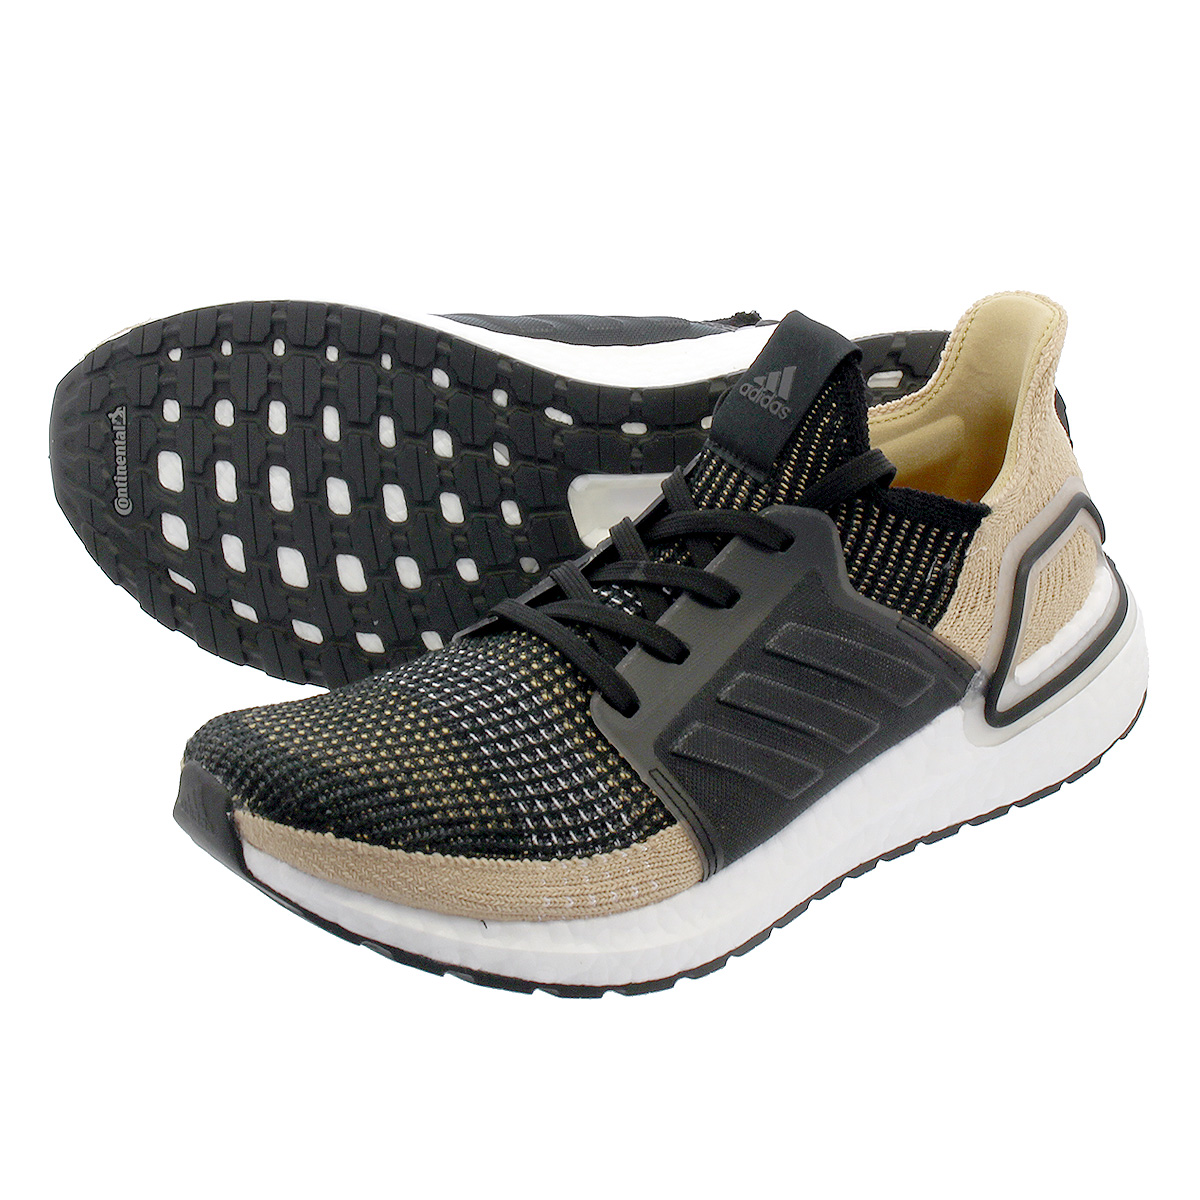 adidas ULTRA BOOST 19 アディダス ウルトラ ブースト 19 CORE BLACK/RAW SAND/GREY SIX f35241